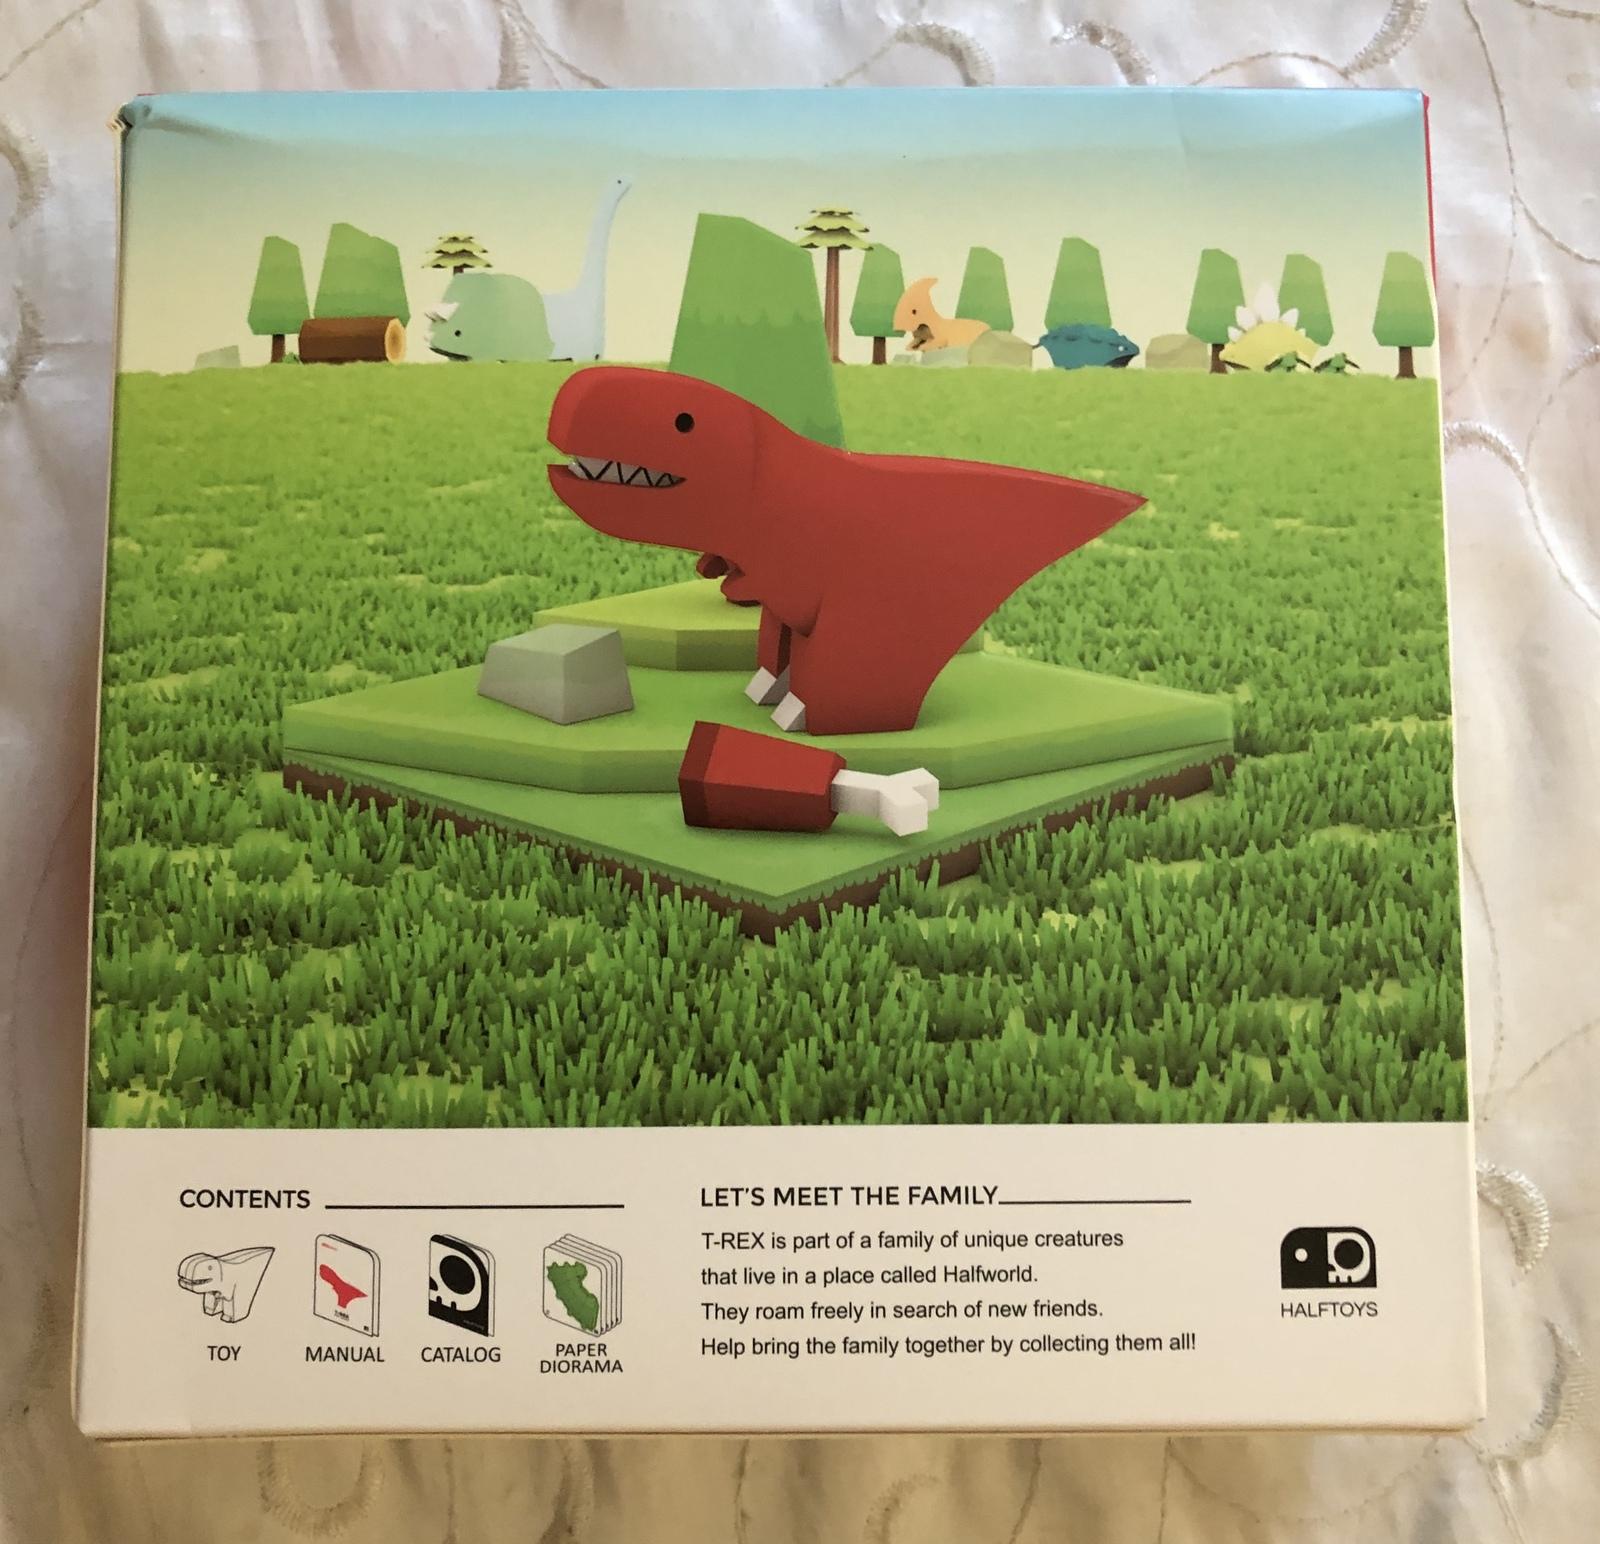 Halftoys Dino Series 002 Tyrannosaurus Rex Puzzle Toy Set ...